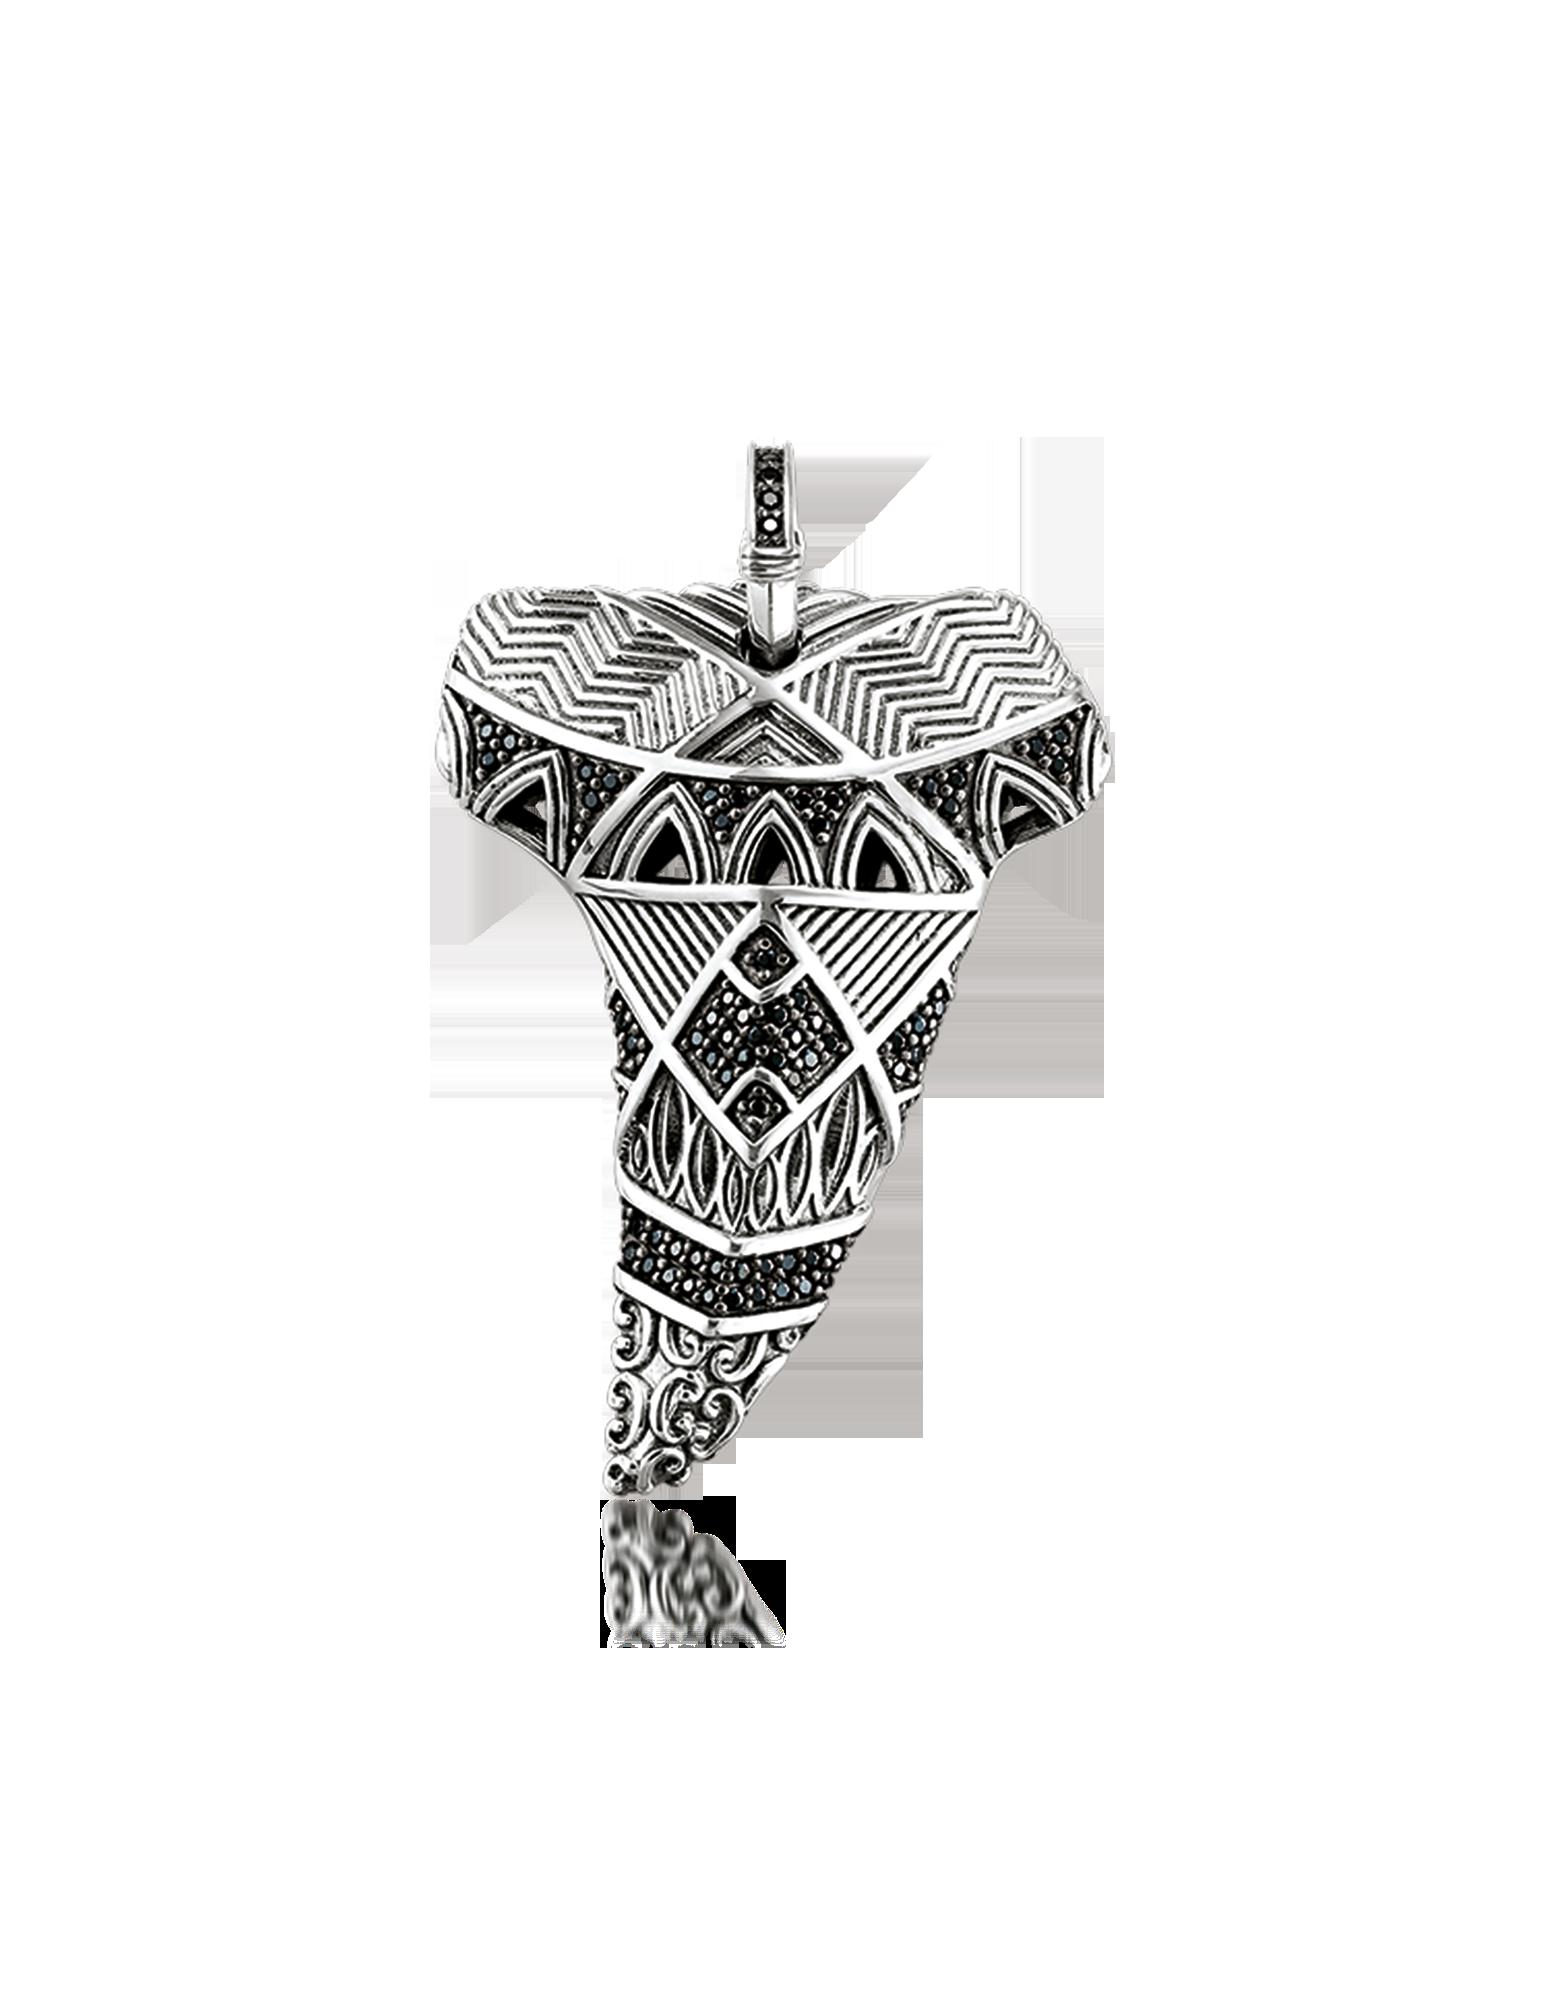 Image of Blackened Sterling Silver Maori Tooth Pendant w/Black Zirconia